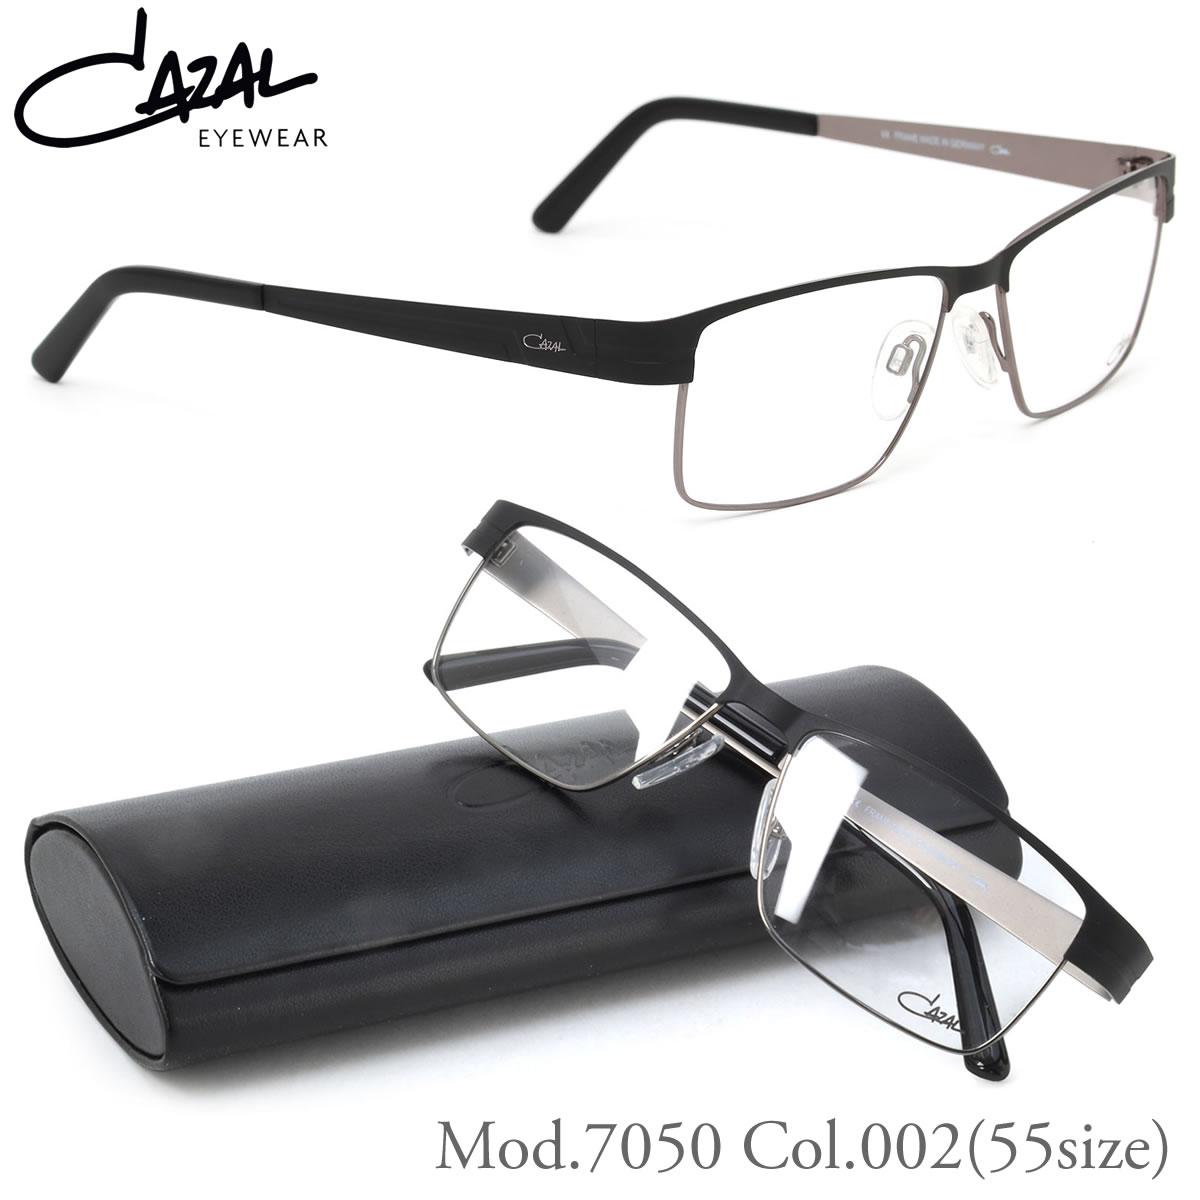 0f2c240ee7 (Casal) glasses frame 7050 002 55 size square titanium Casal CAZAL men women